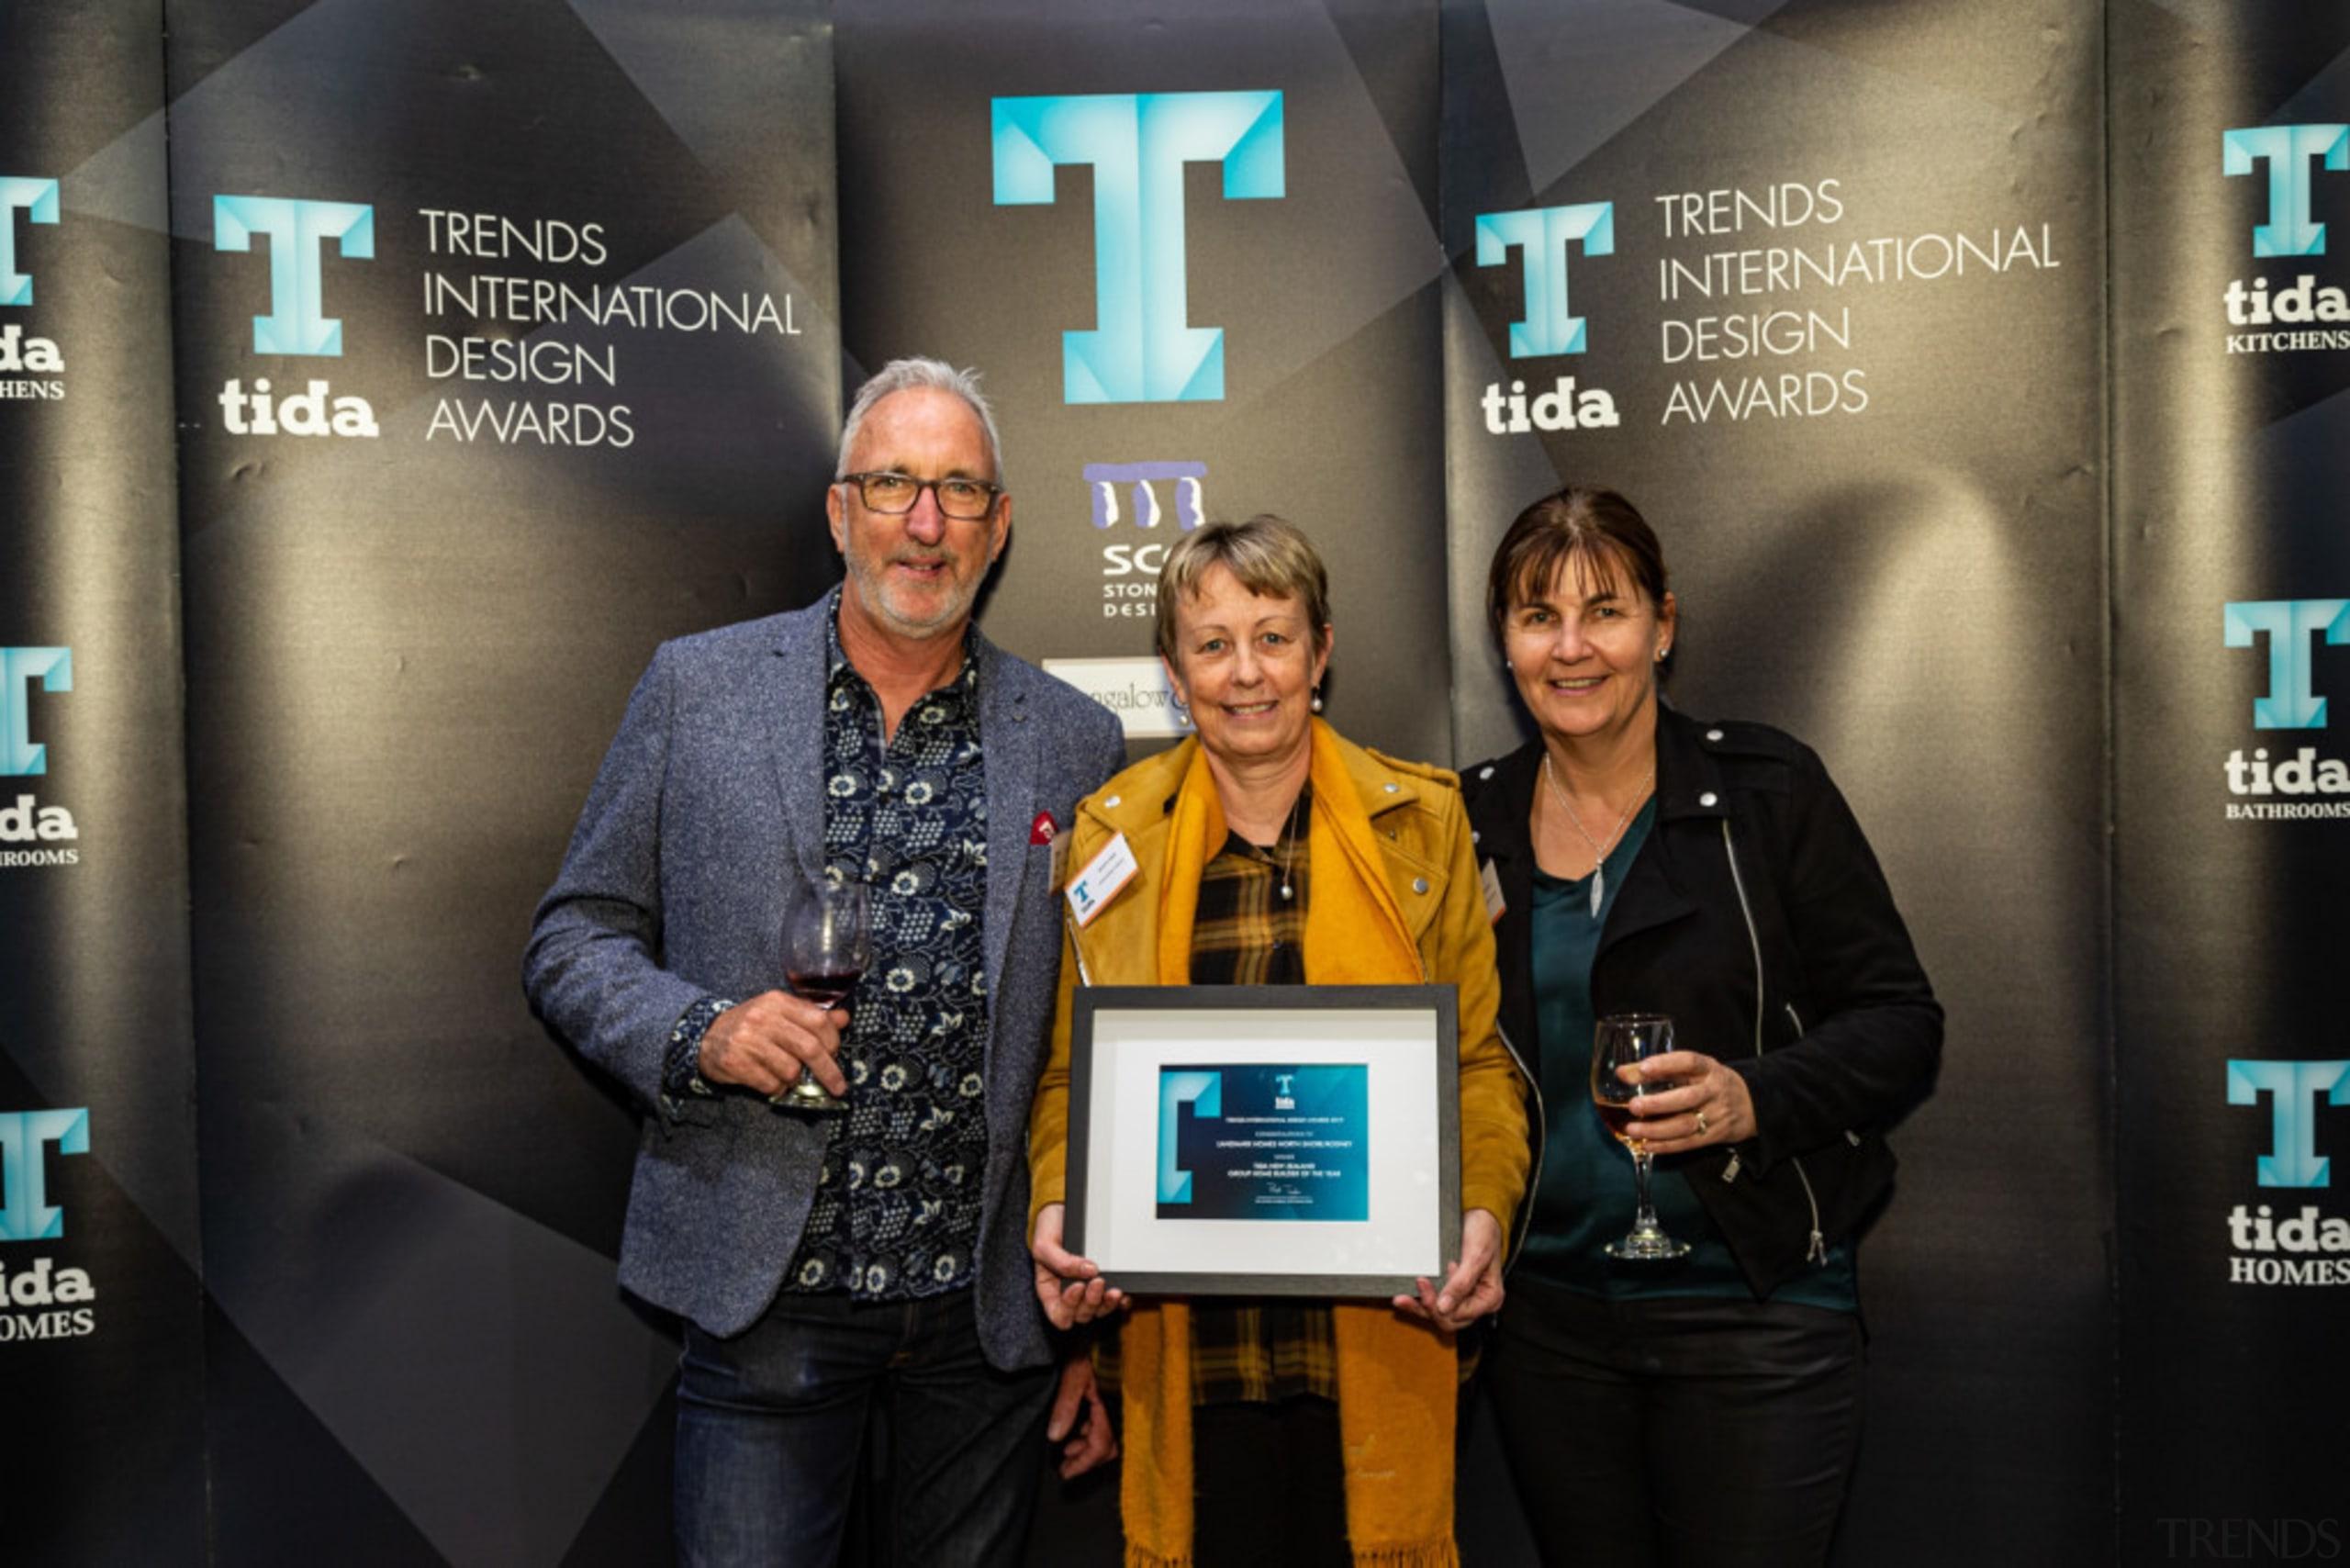 2019 TIDA New Zealand Homes presentation evening award, event, technology, yellow, black